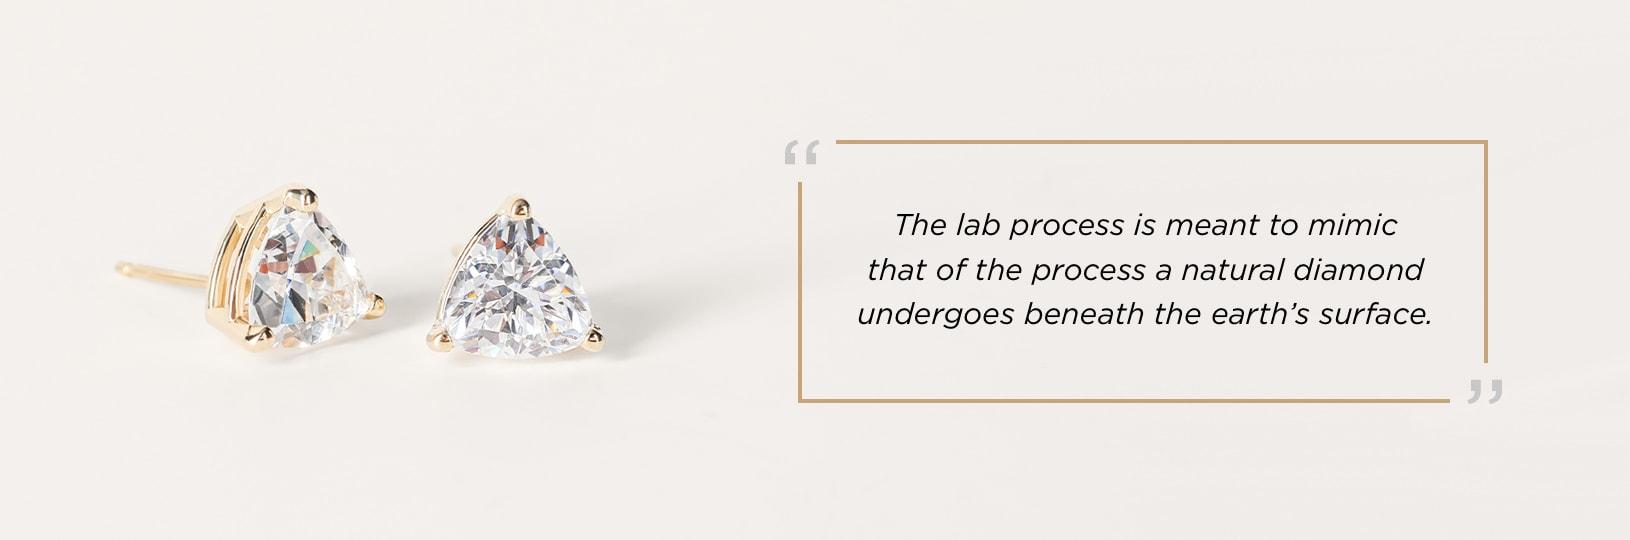 The lab process mimics the process that a natural diamond undergoes